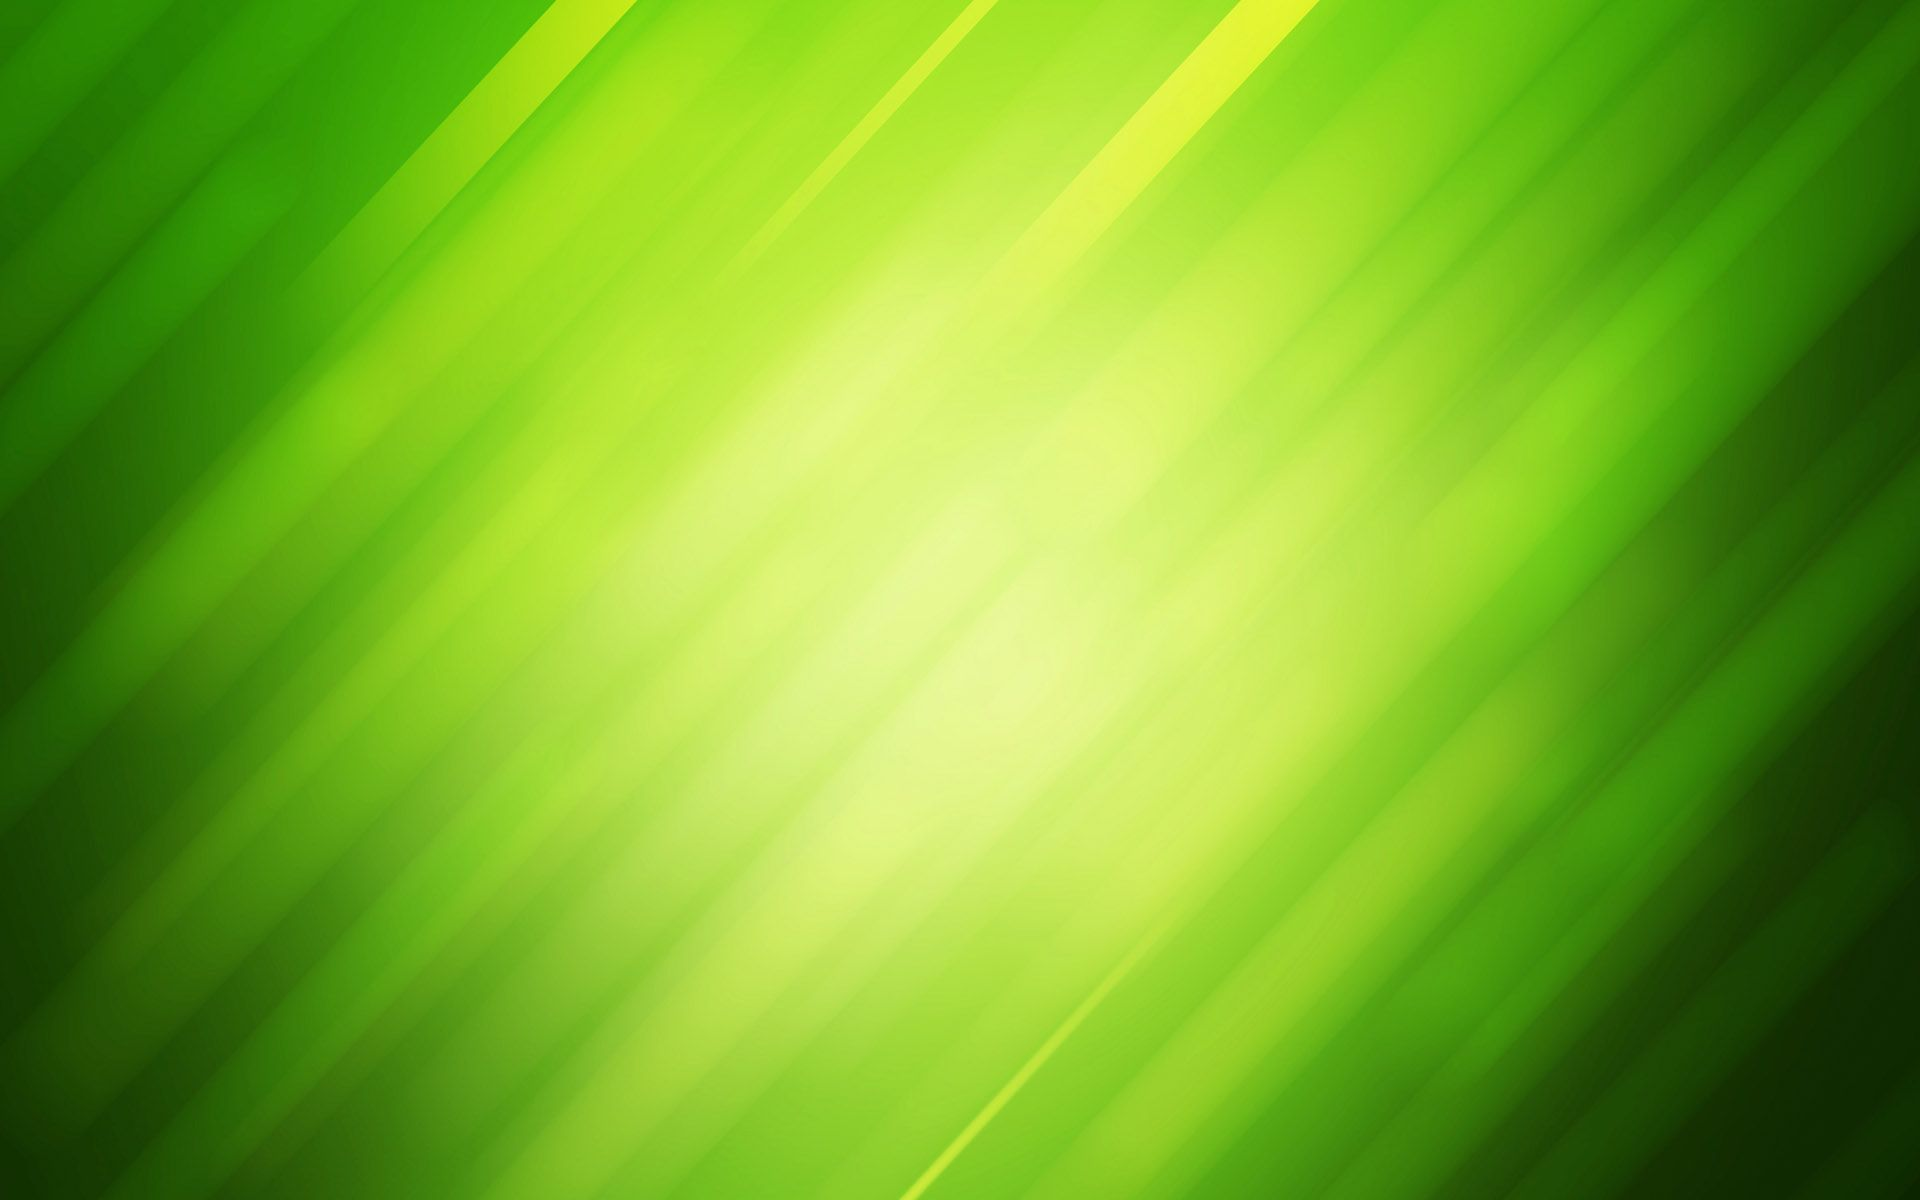 Green Hd Wallpaper